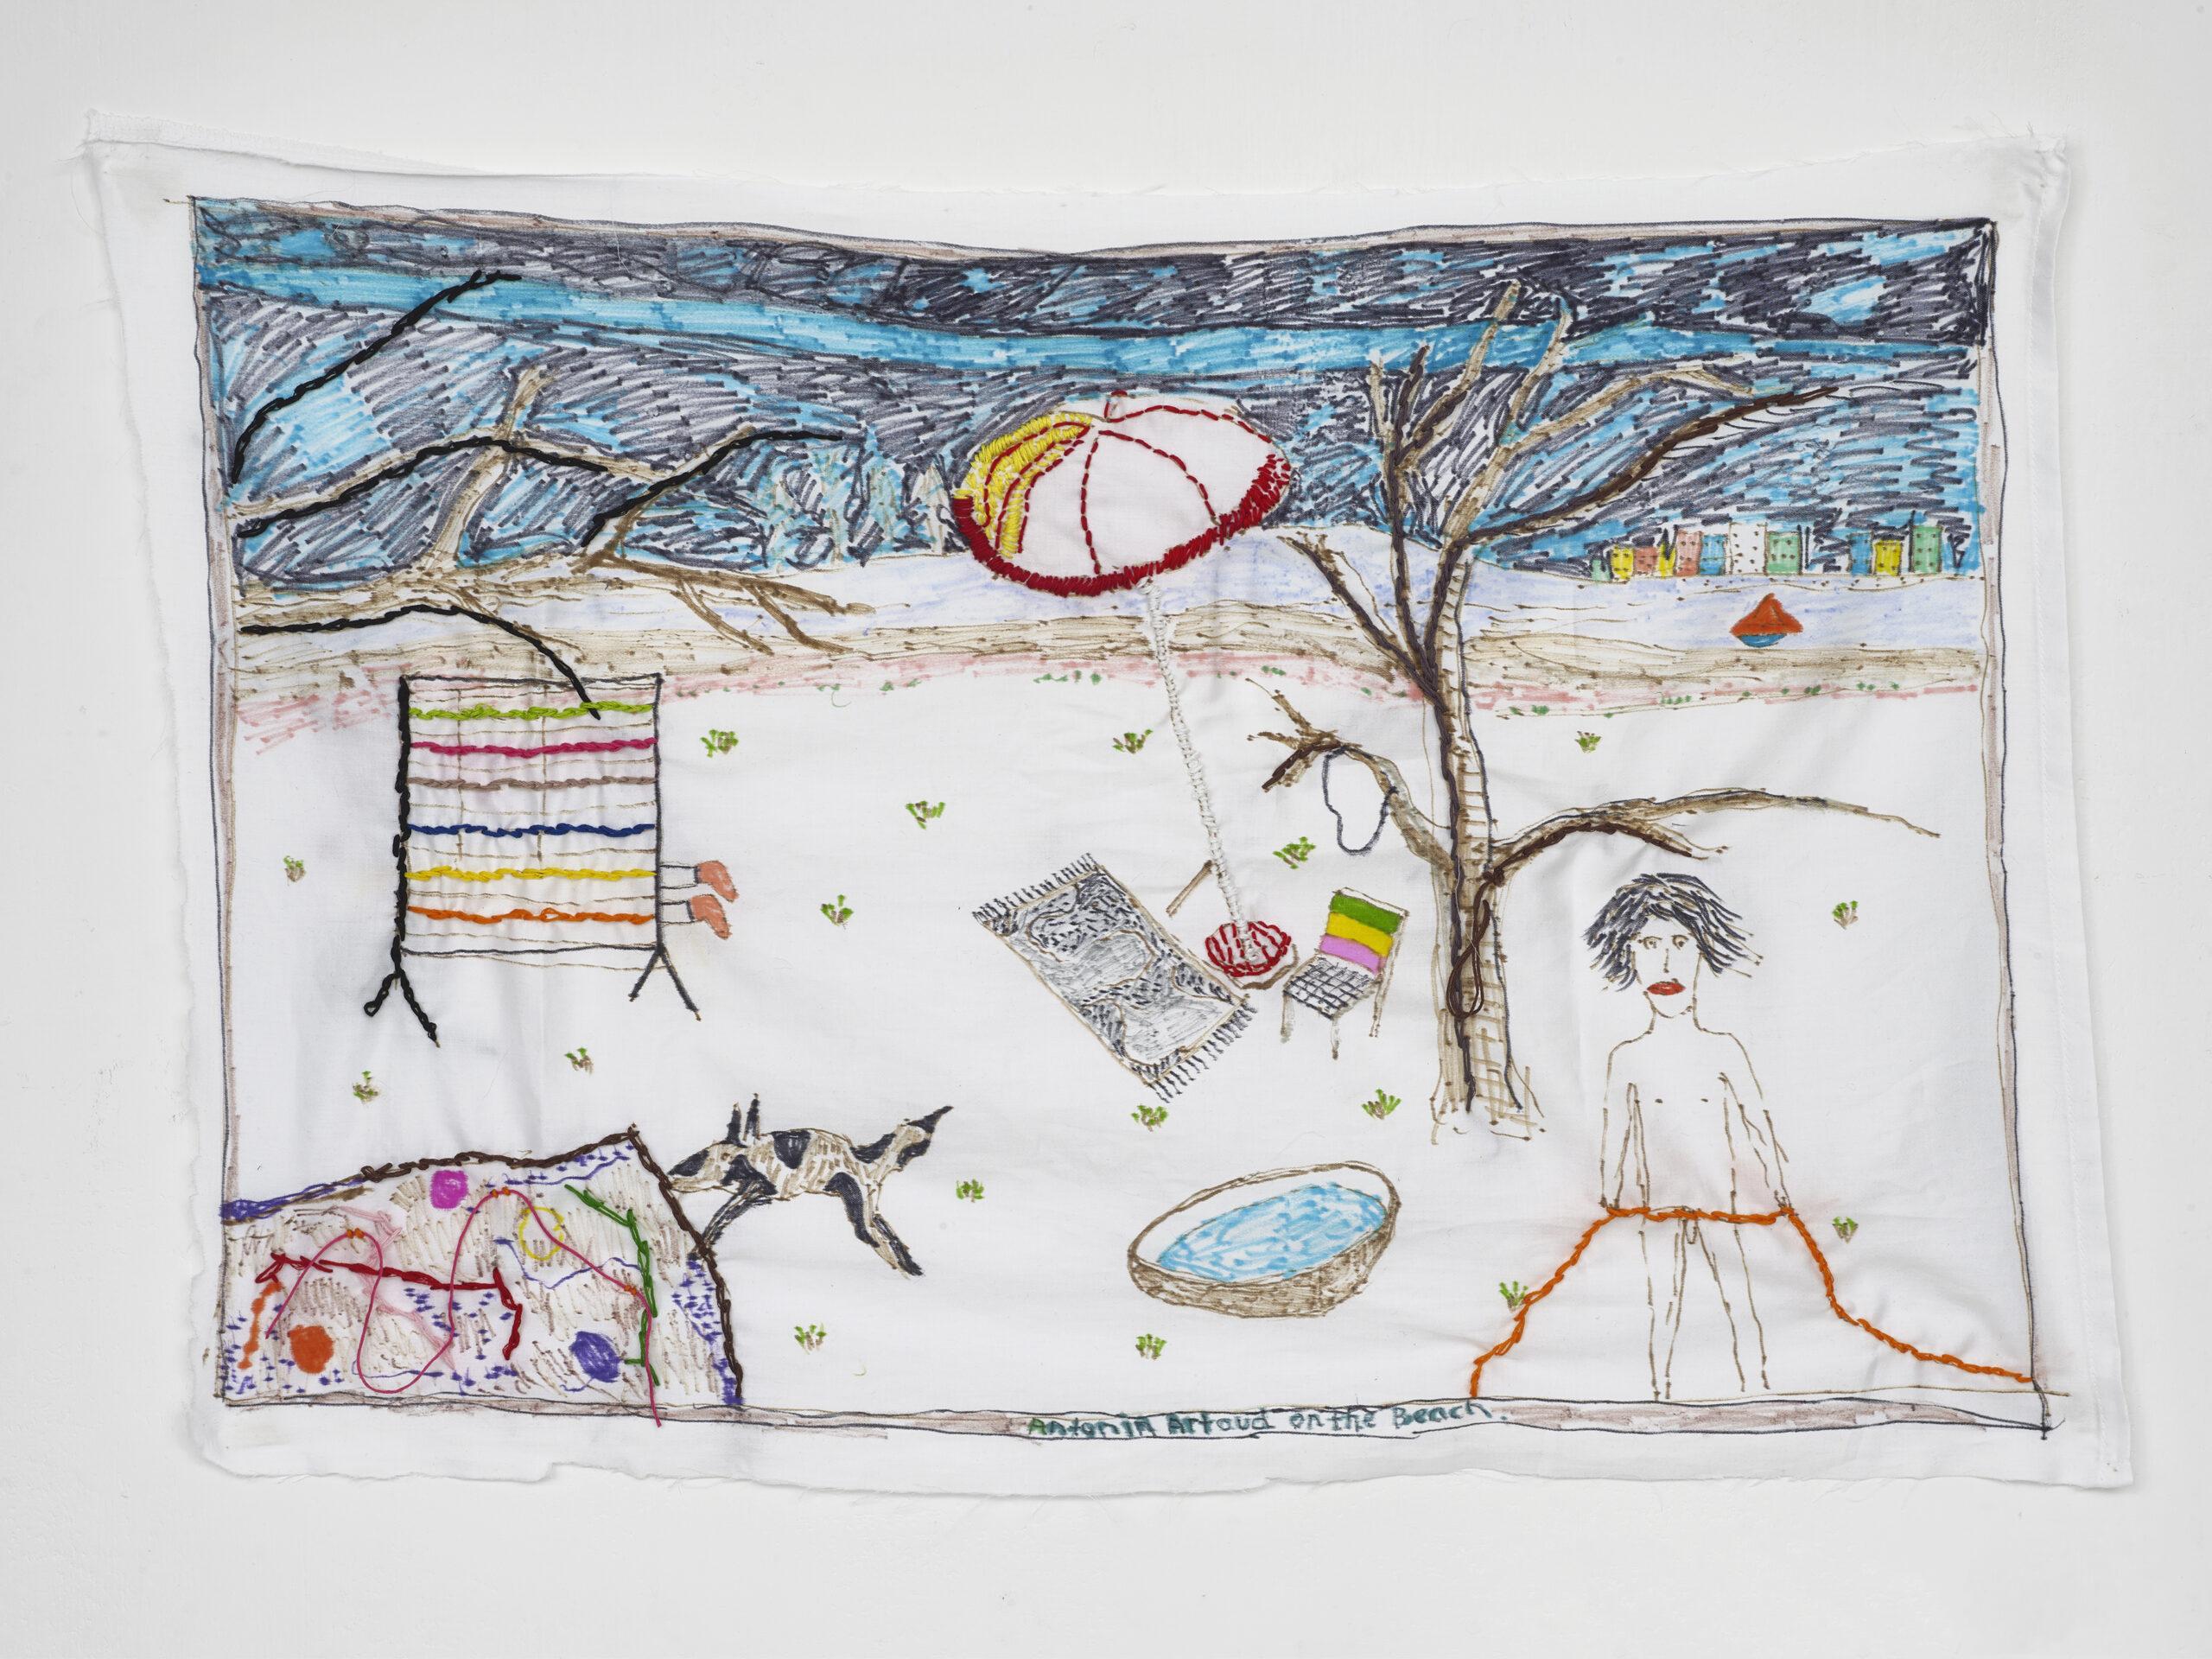 Brian Dawn Chalkley Antonin Artaud on the beach (2020) Pencil, felt tip and thread on cotton pillow case, 75 cm x 45 cm.